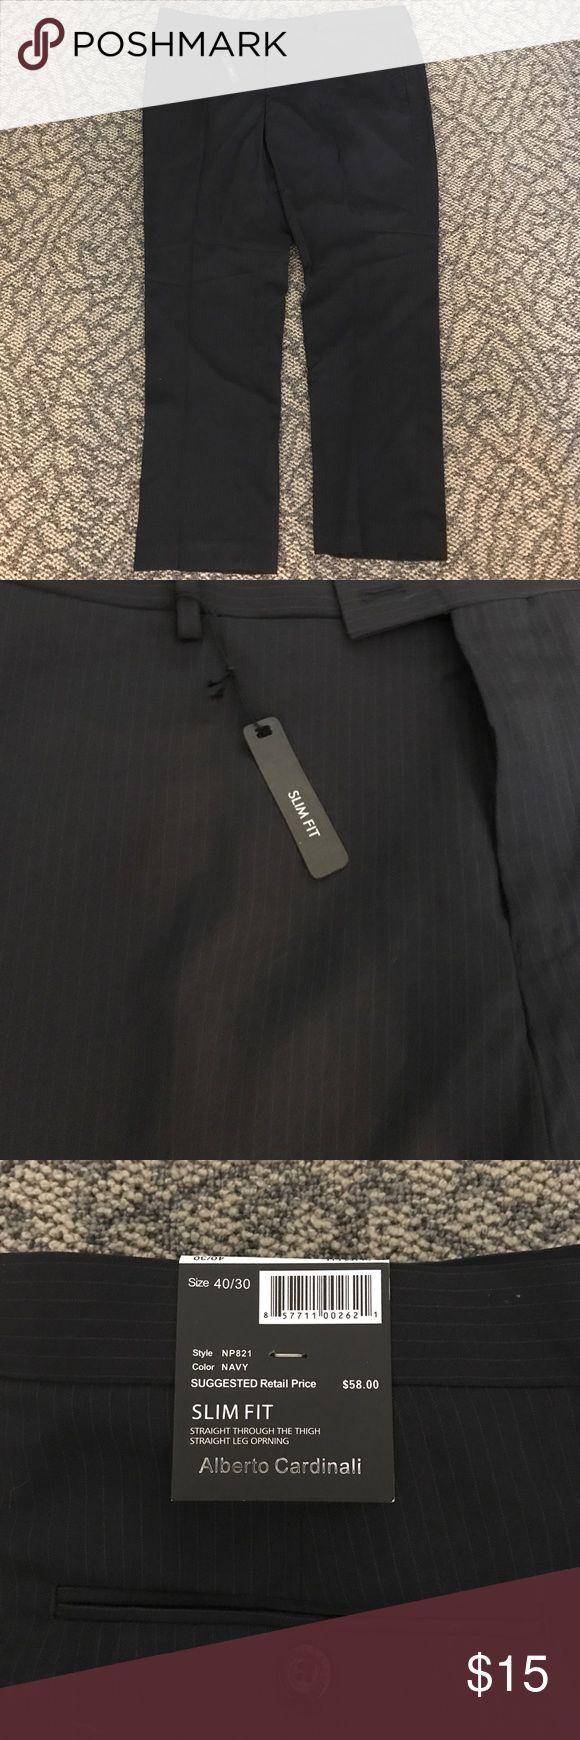 Alberto Cardinali Slim Fit Dress Pants 40/30 Alberto cardinali slim fit dress pants size 40/30 color navy. New. Color is navy and they are stripped alberto cardinali Pants Dress